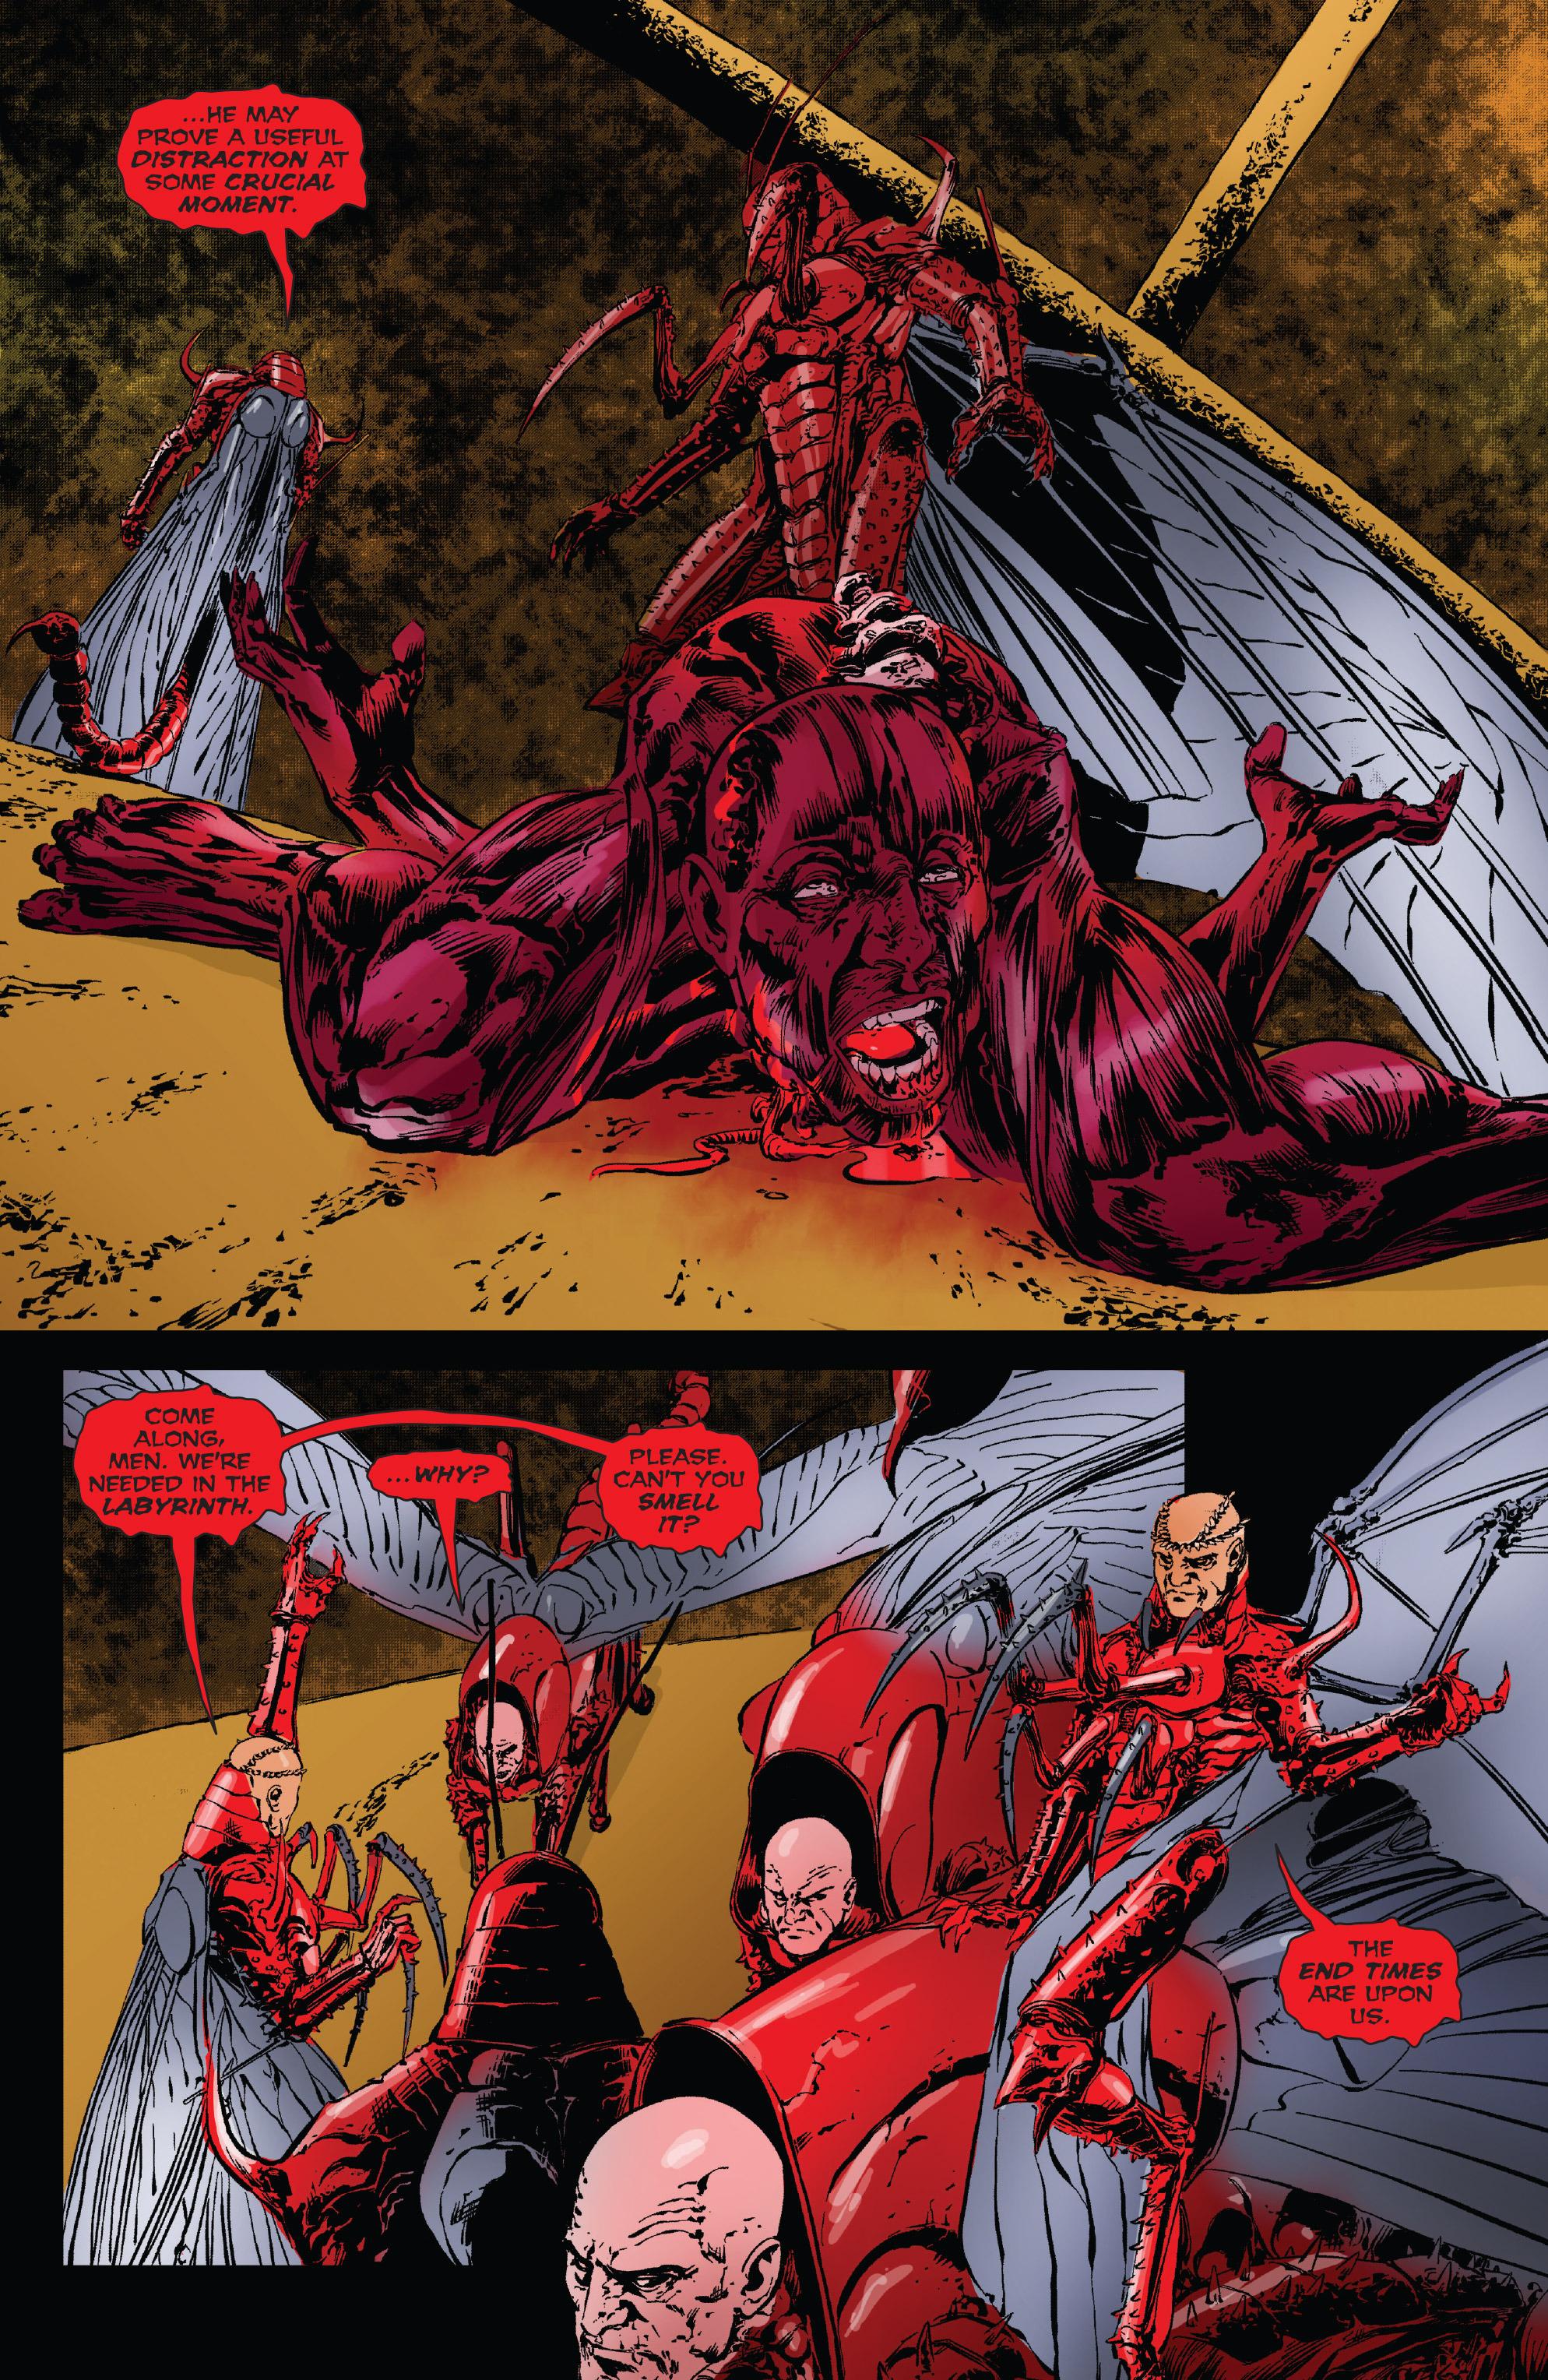 Read online Clive Barker's Hellraiser: The Dark Watch comic -  Issue # TPB 3 - 109